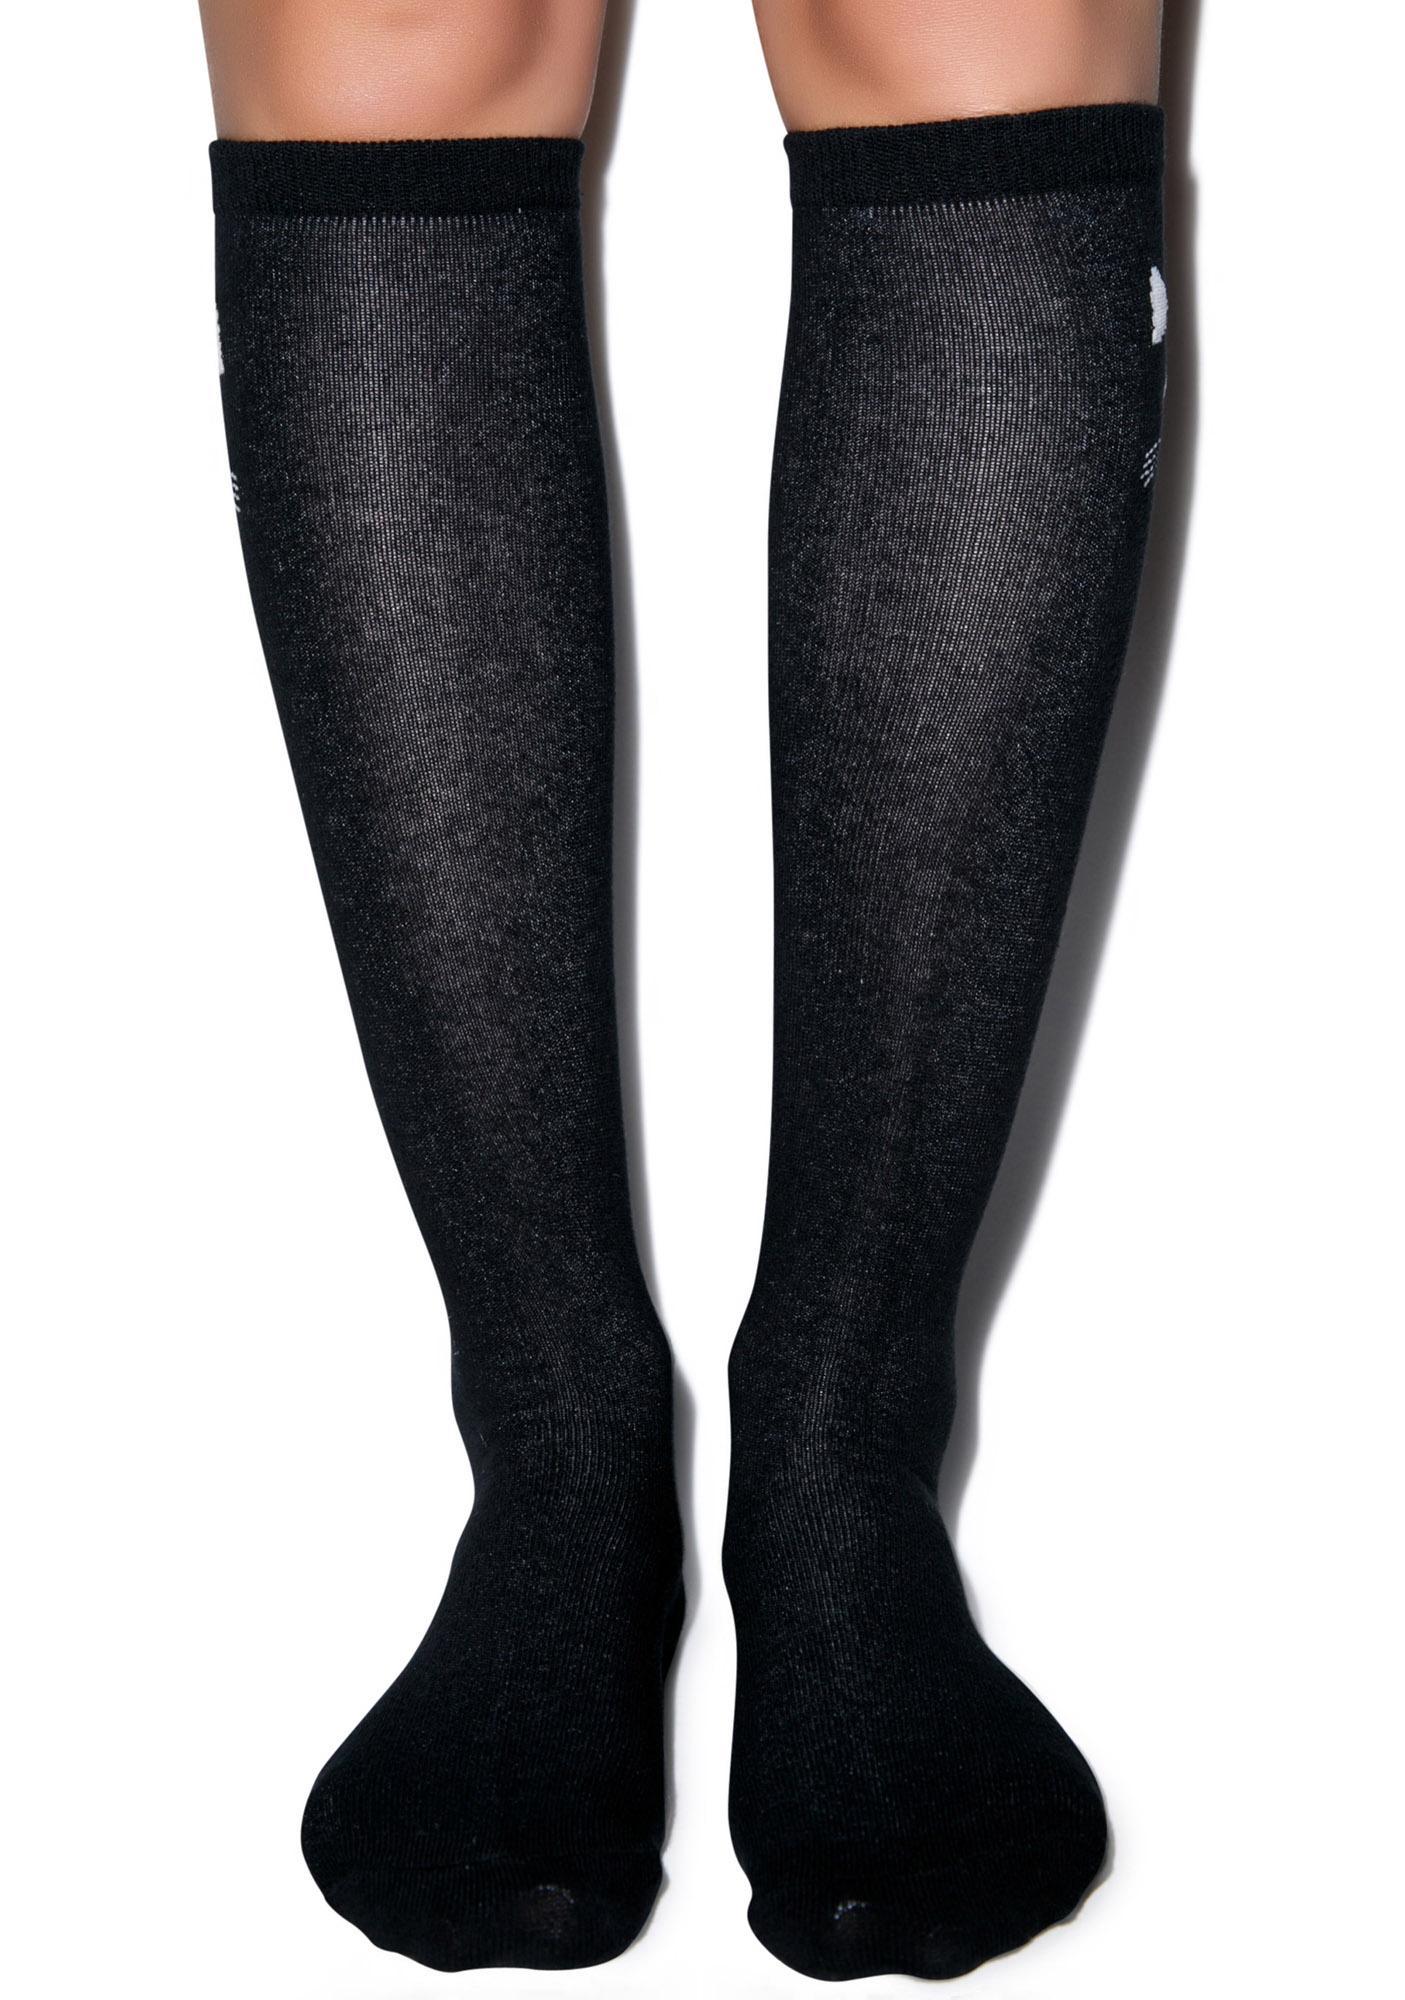 Choupette Knee High Socks